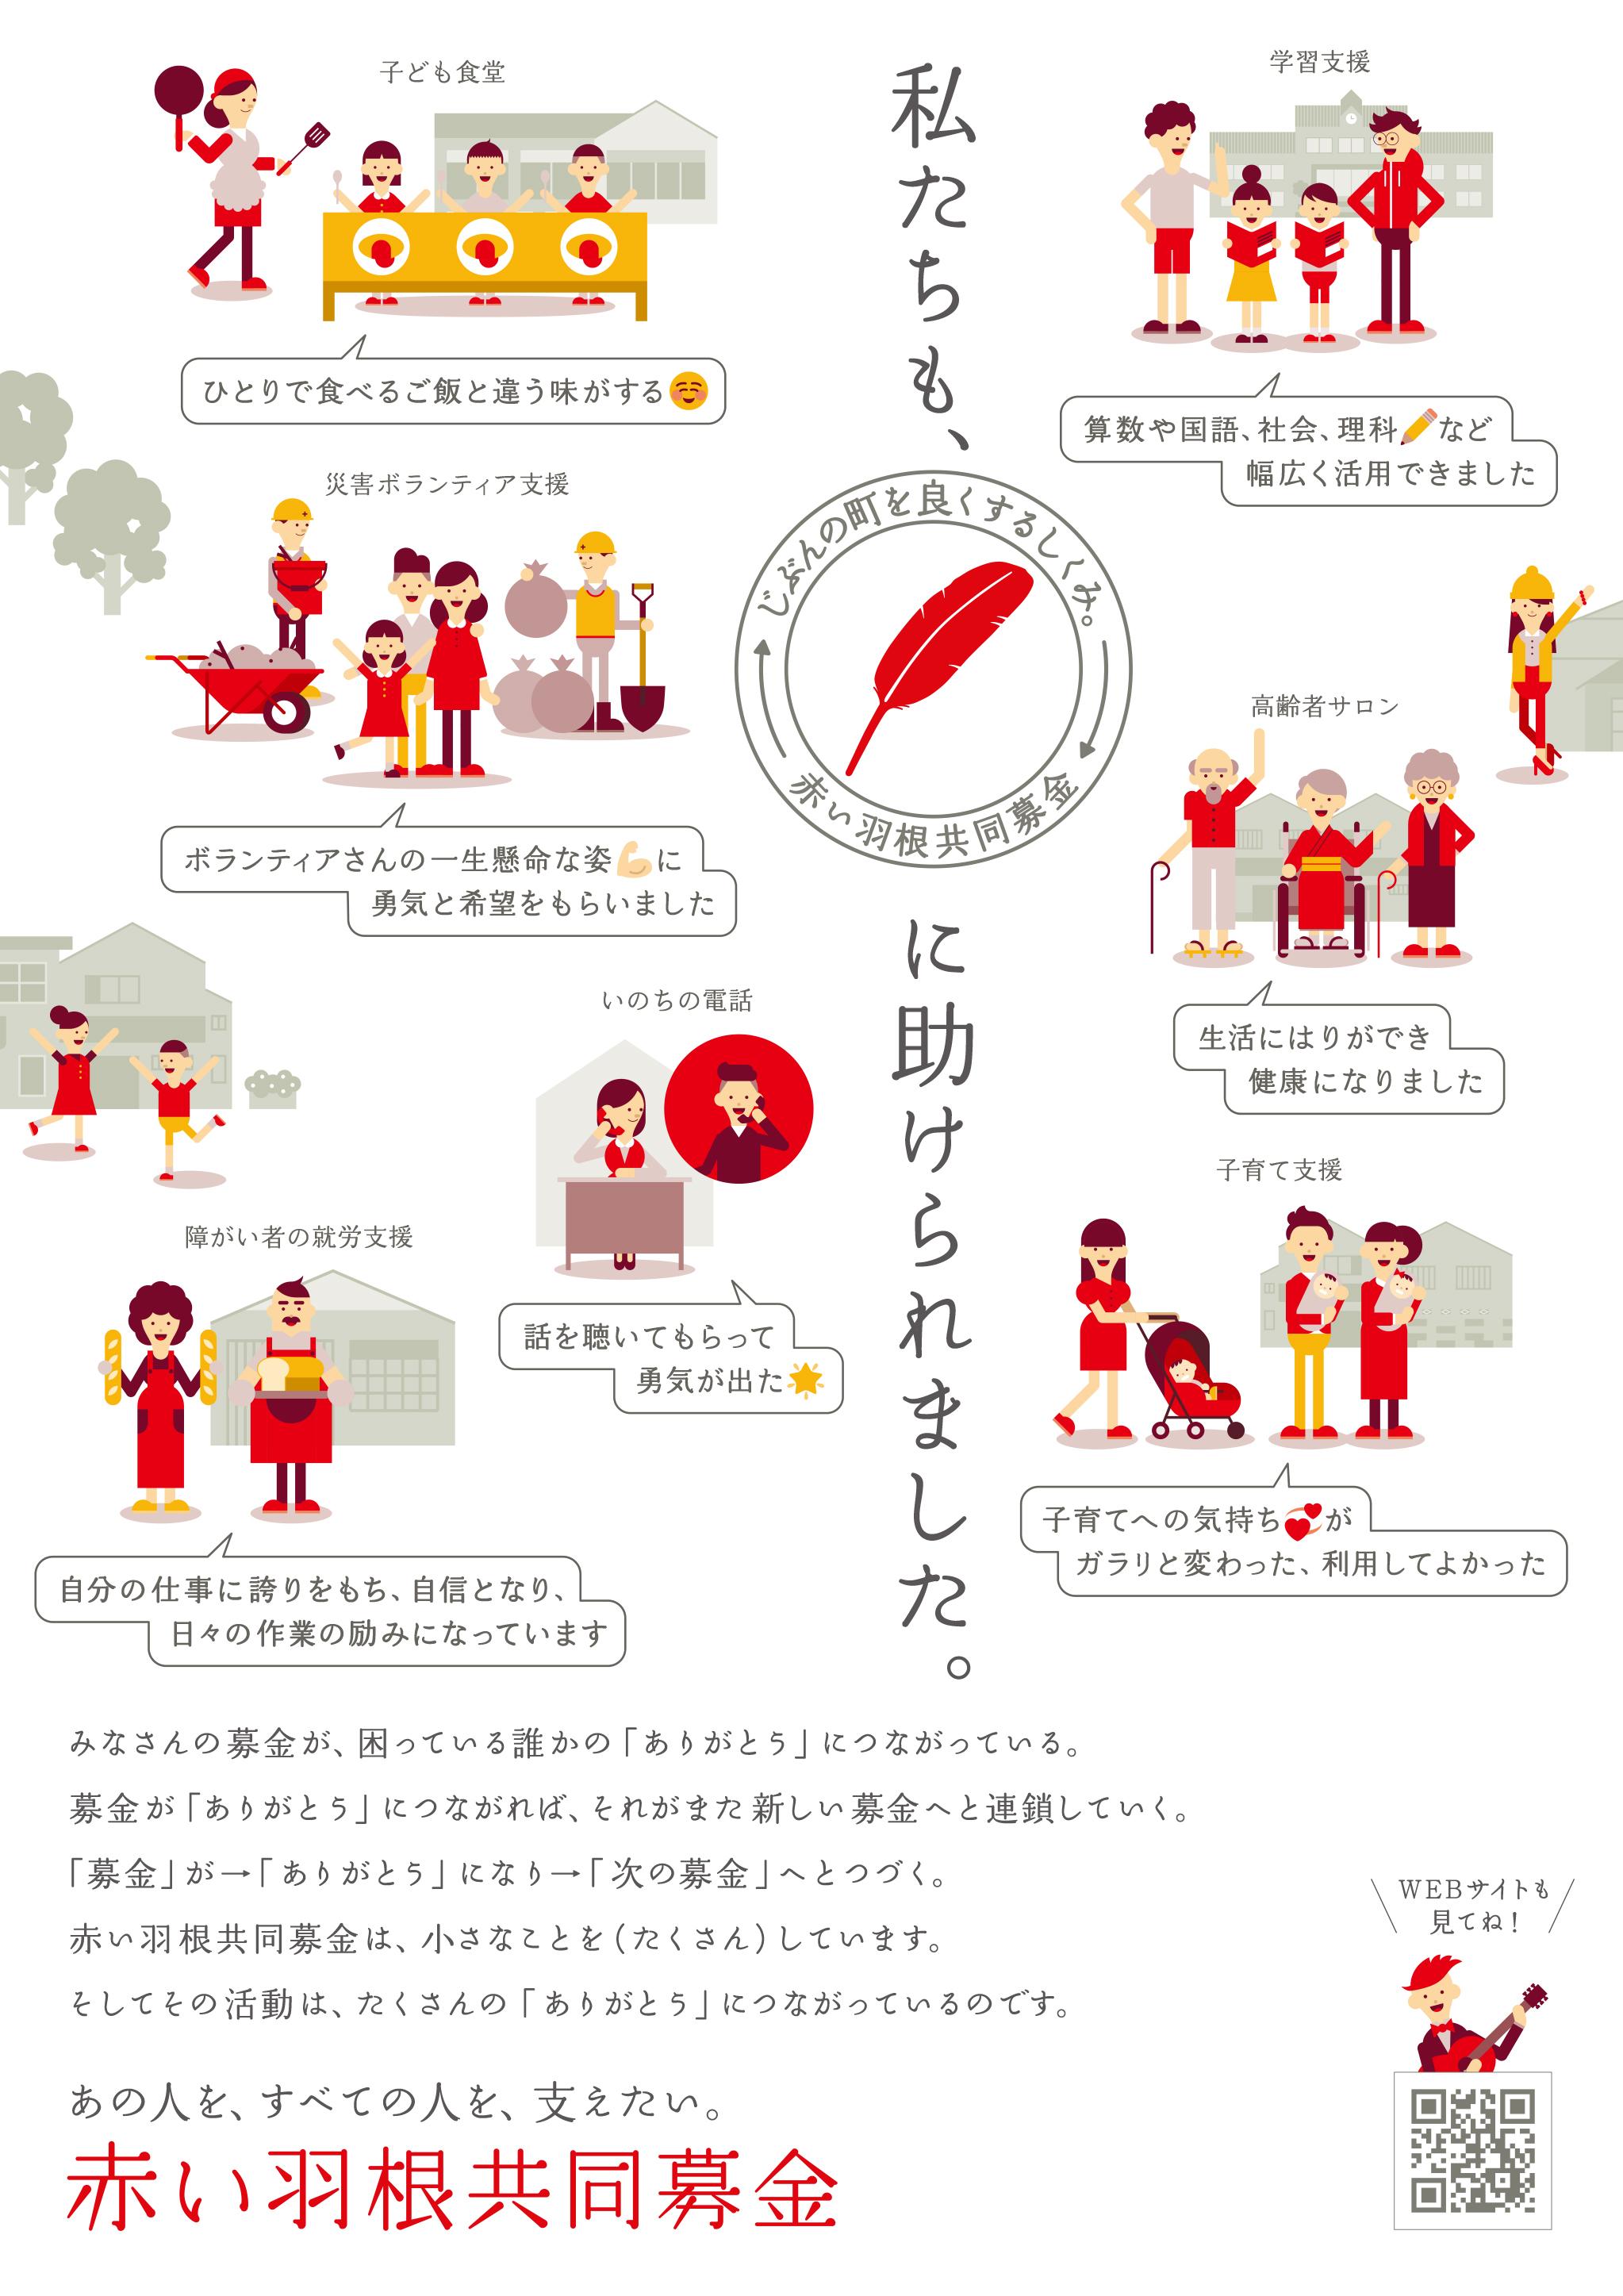 180613_akaihane_asize_f_a5_ol.jpg